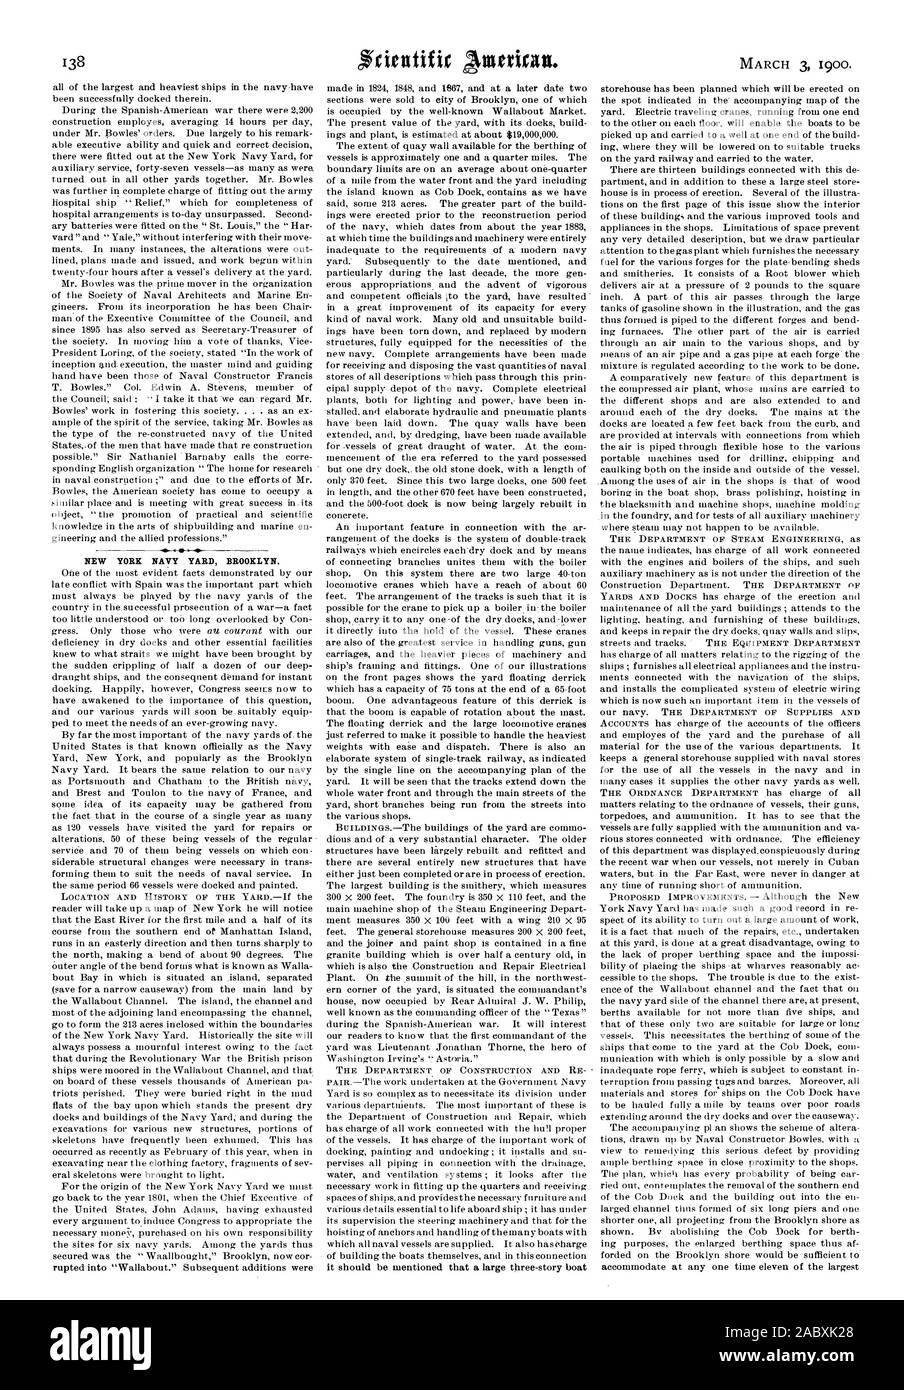 NEW YORK NAVY YARD BROOKLYN., scientific american, 1900-03-03 Stock Photo